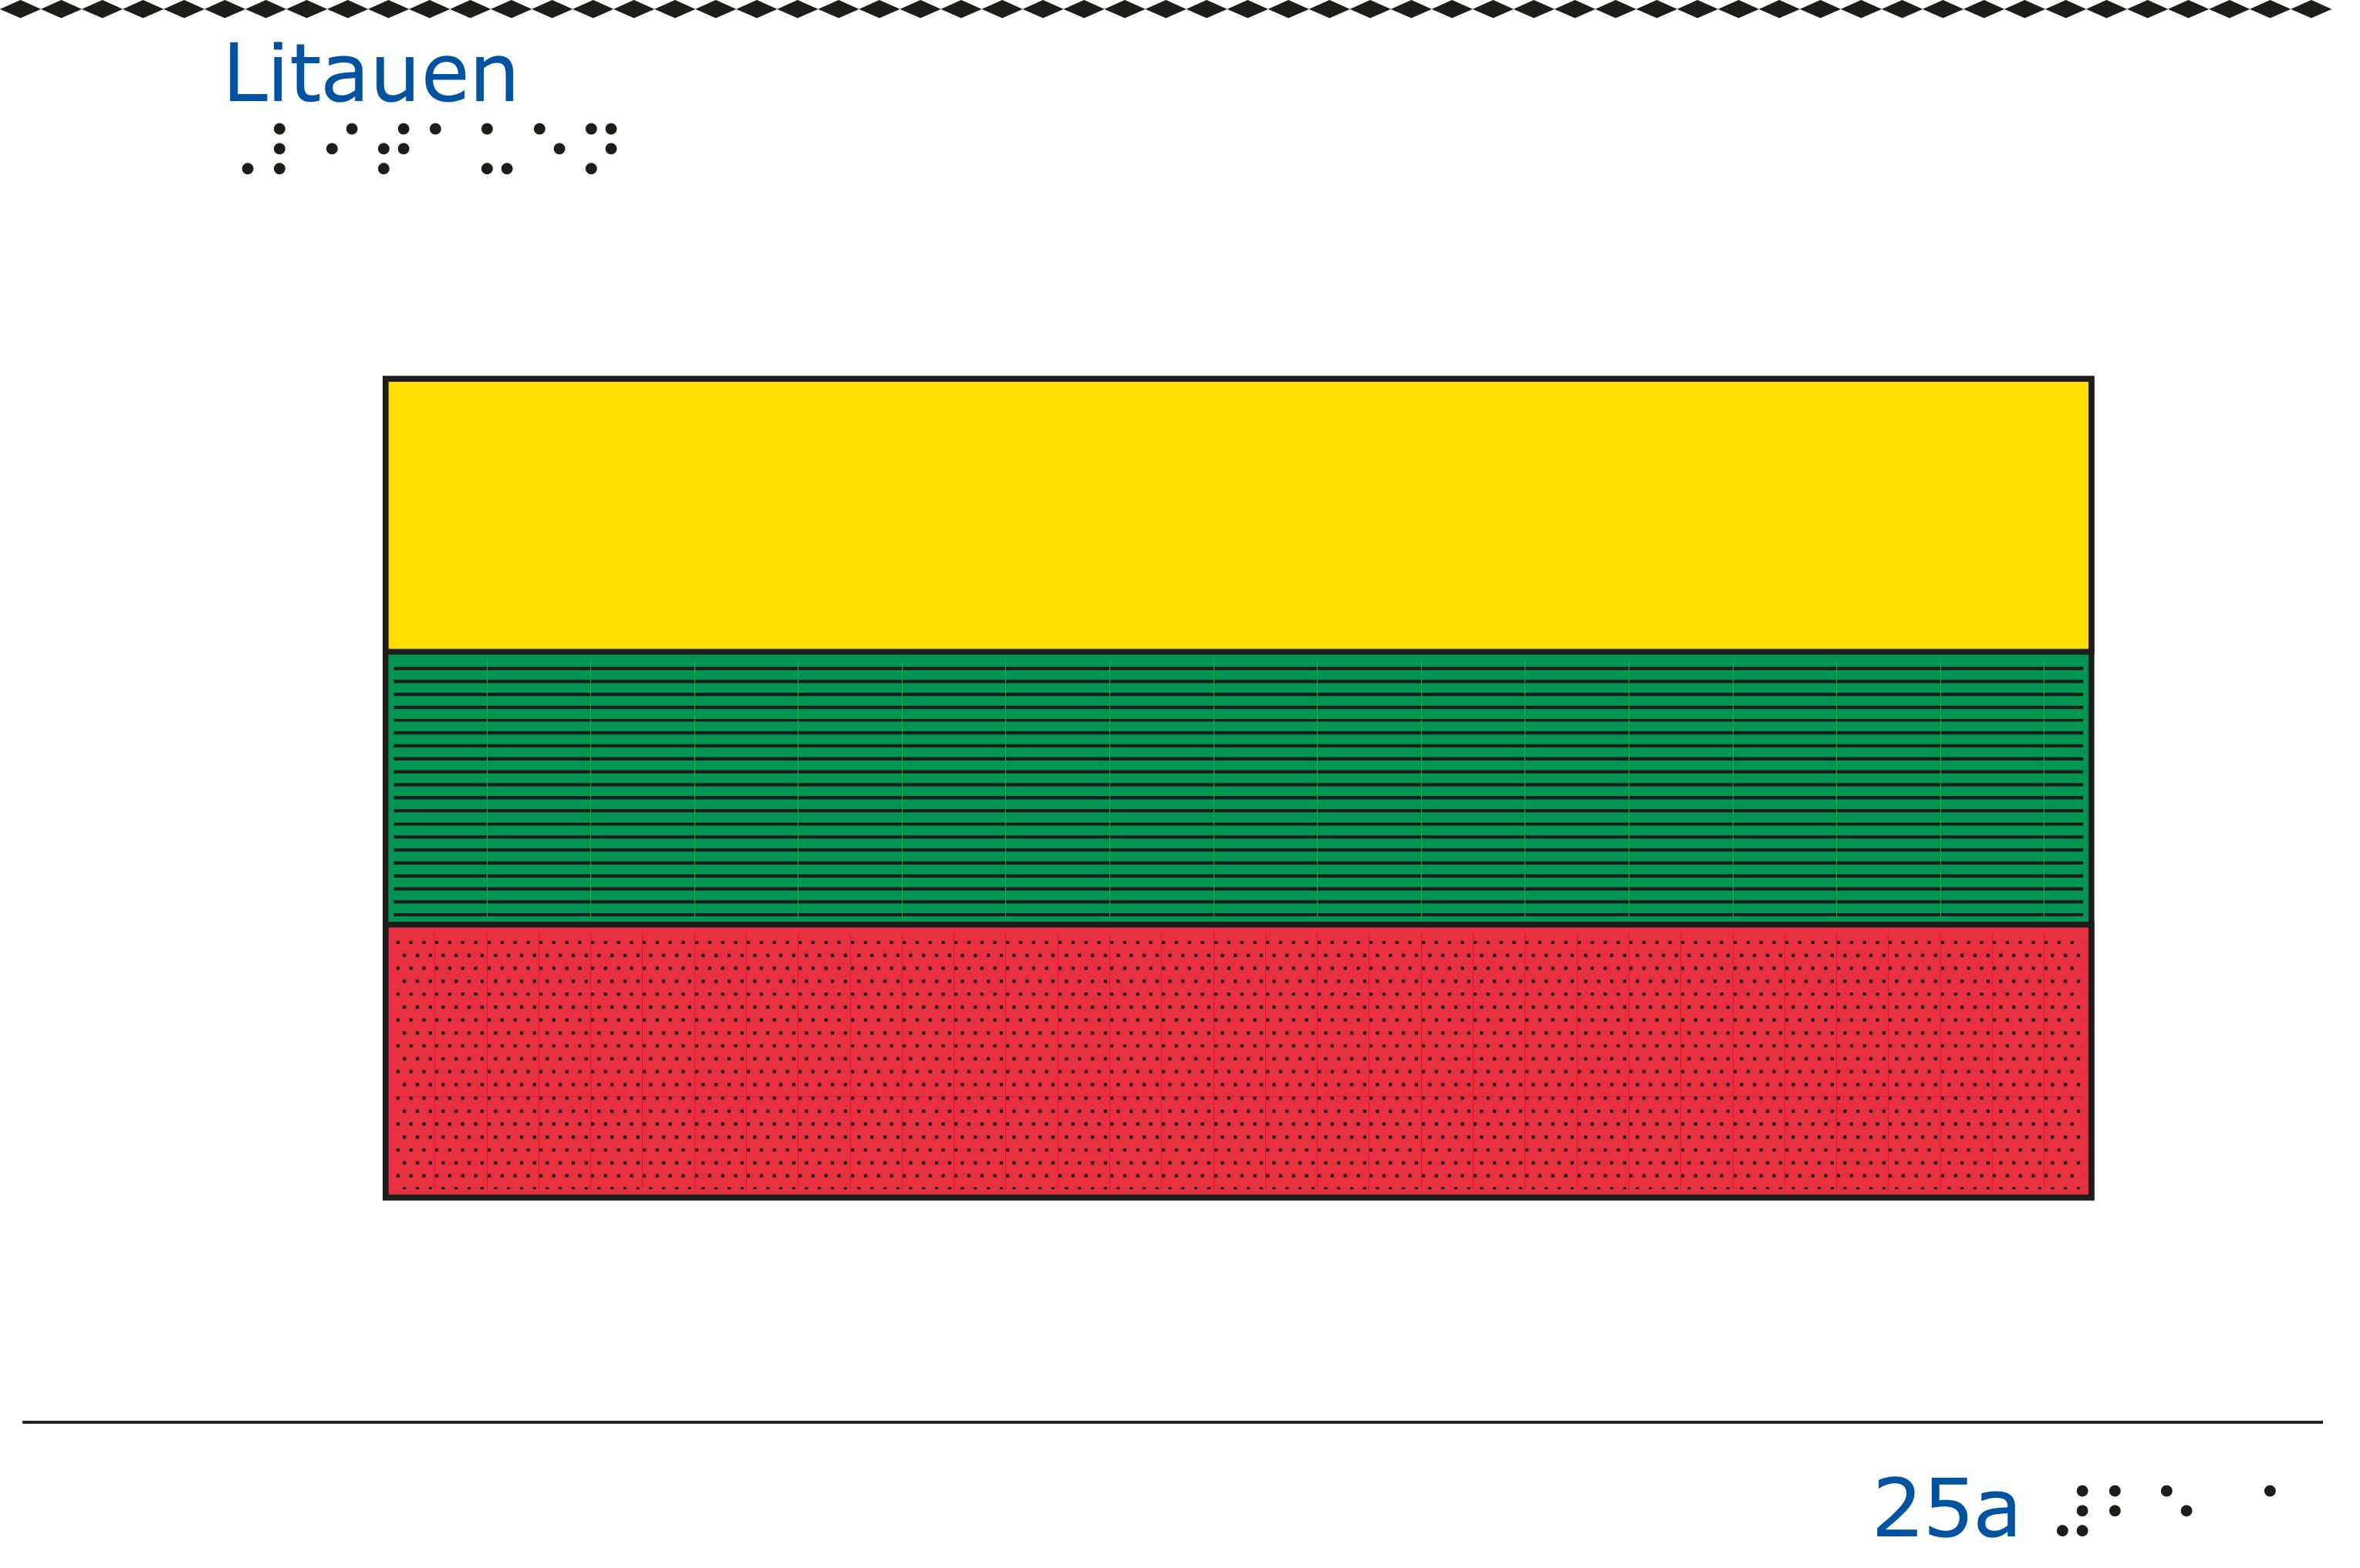 Taktil bild - Litauens flagga.